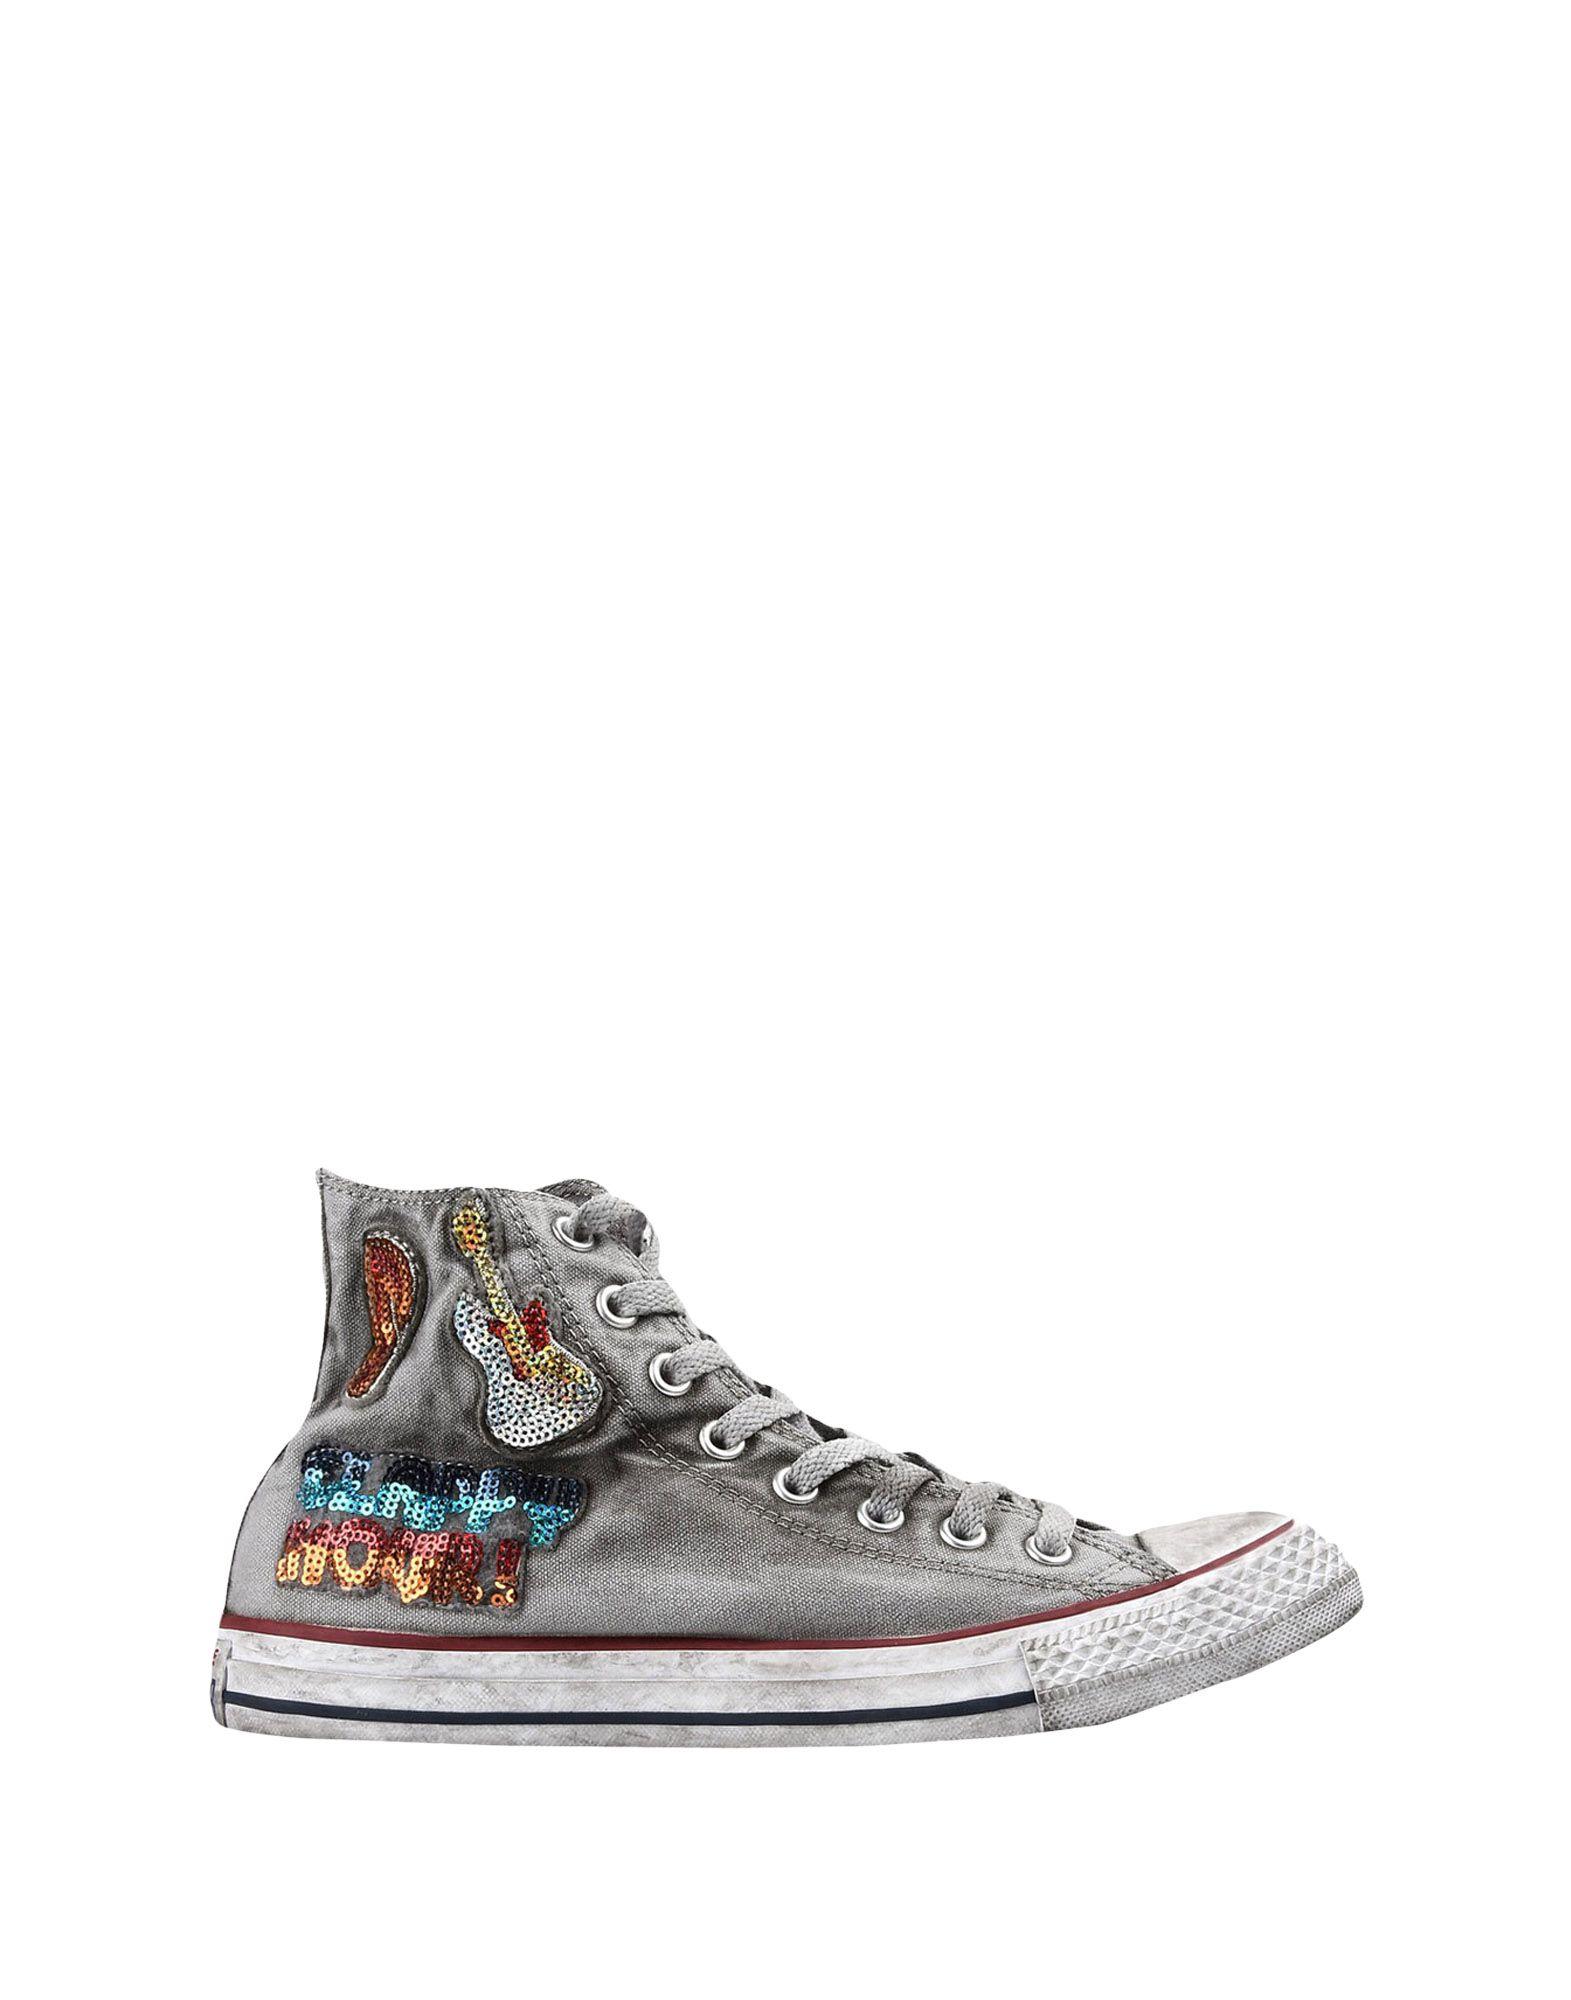 Sneakers Converse Limited Edition Ctas Hi Canvas Ltd - Femme - Sneakers Converse Limited Edition sur